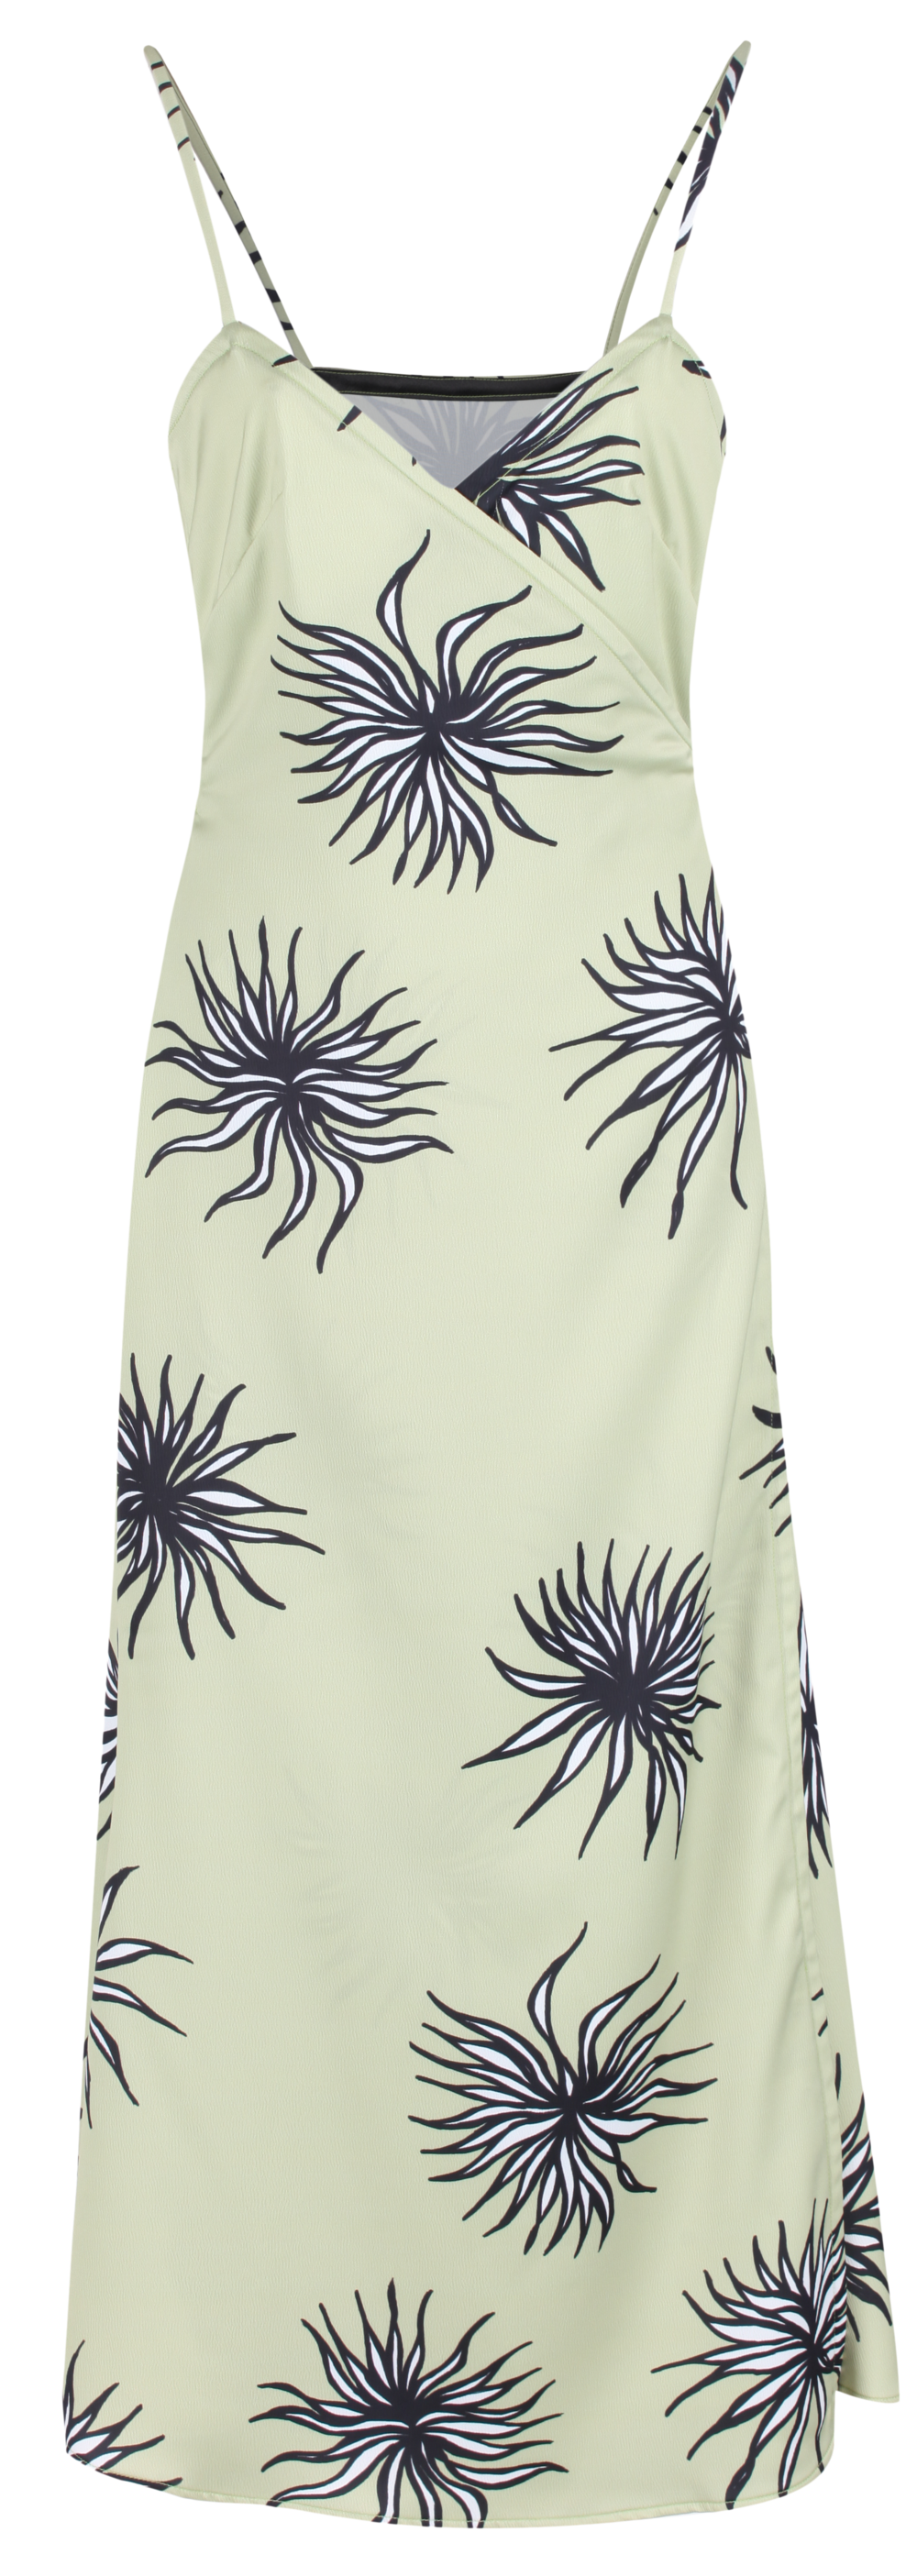 Elara Dress- Dandy - SHOP NOW